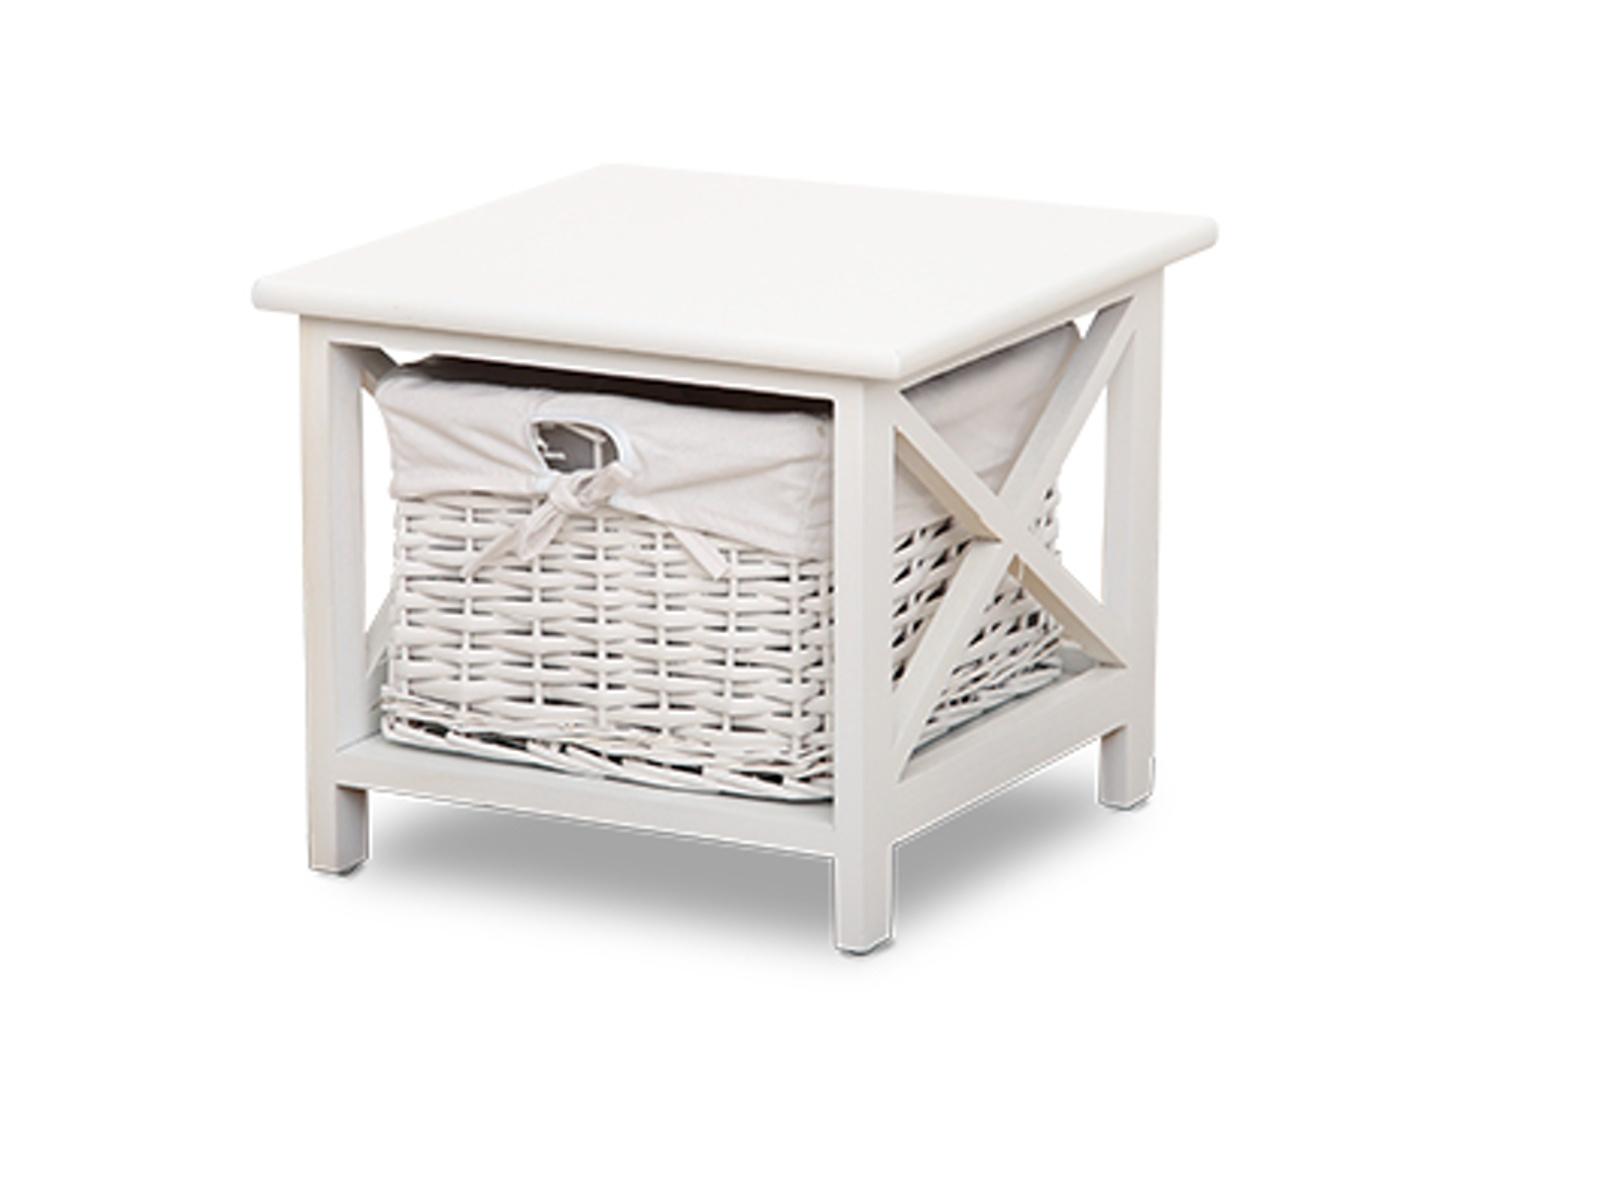 Tempo Kondela Noční stolek RAFAELLO, bílý